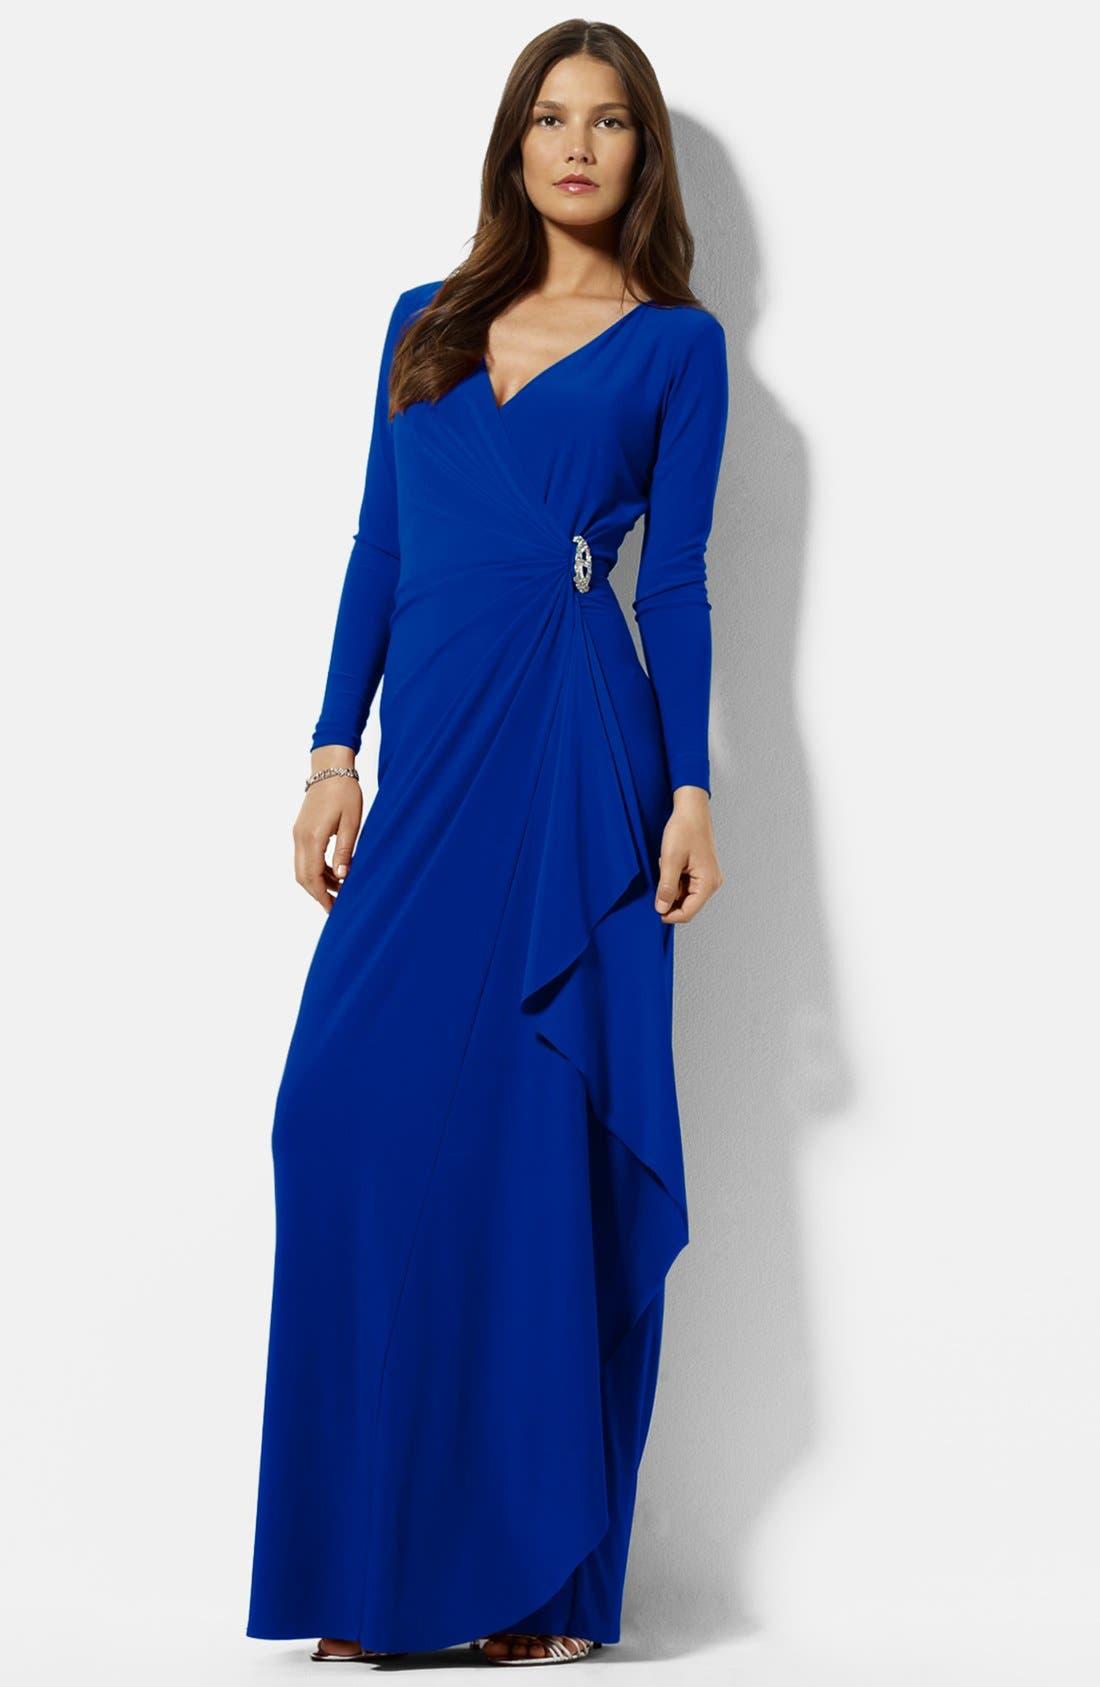 Main Image - Lauren Ralph Lauren Embellished Side Drape Jersey Gown